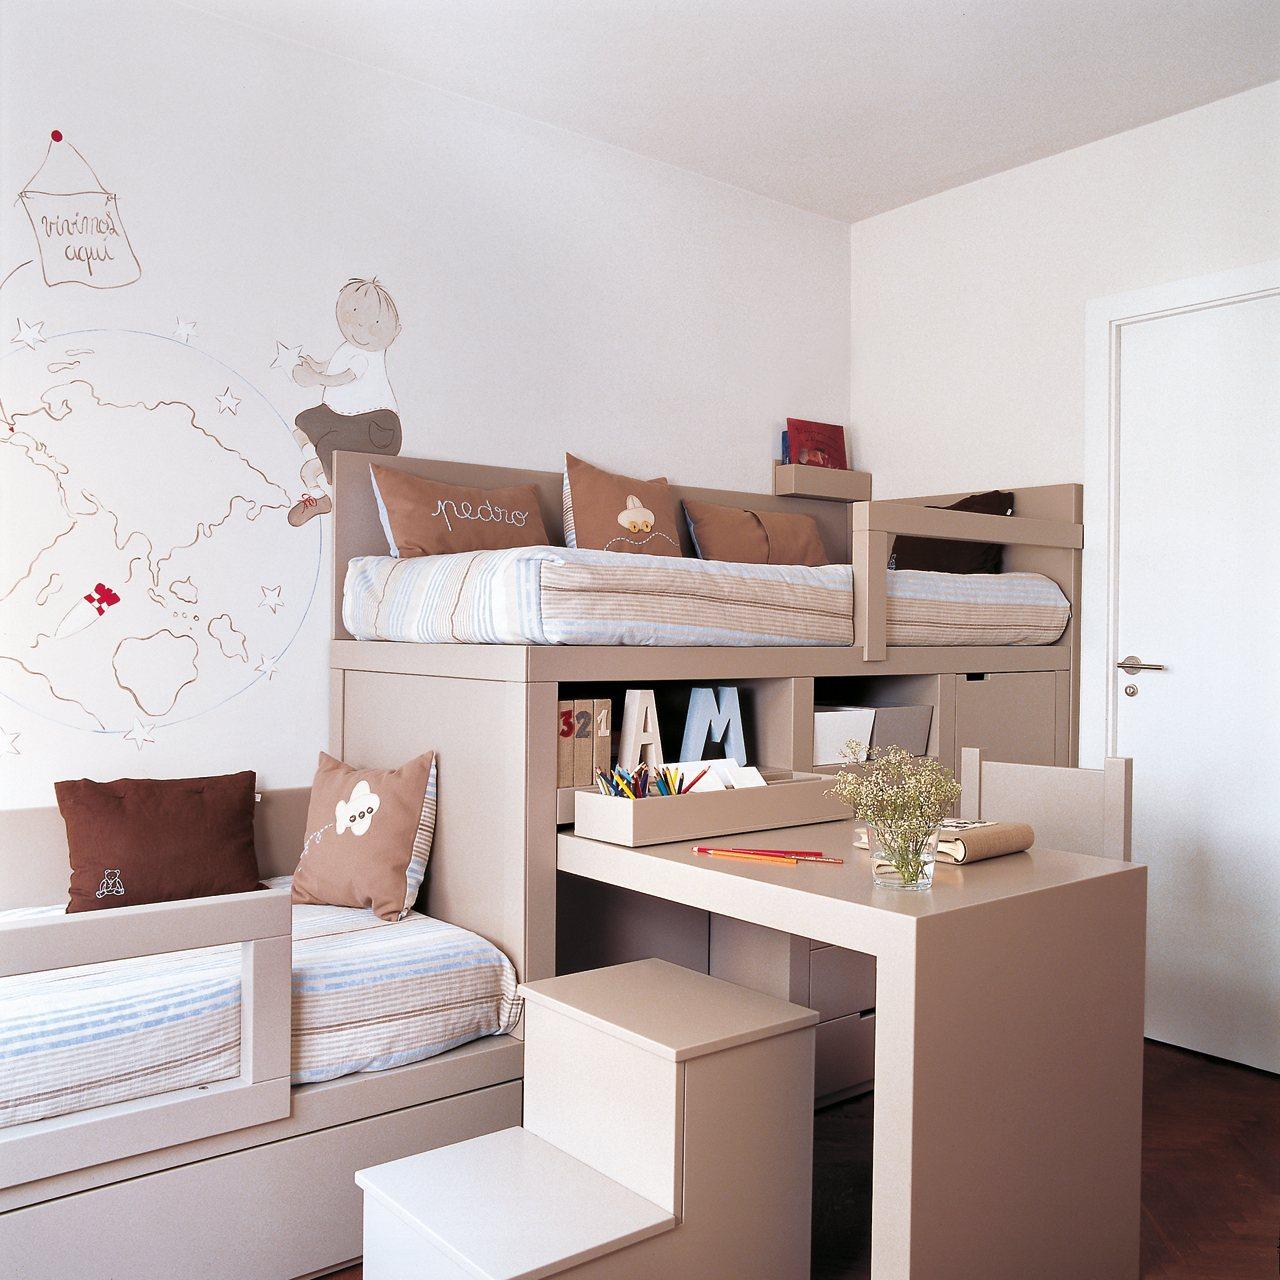 Dormitorios infantiles peque os s cales partido - Literas para ninos espacios pequenos ...